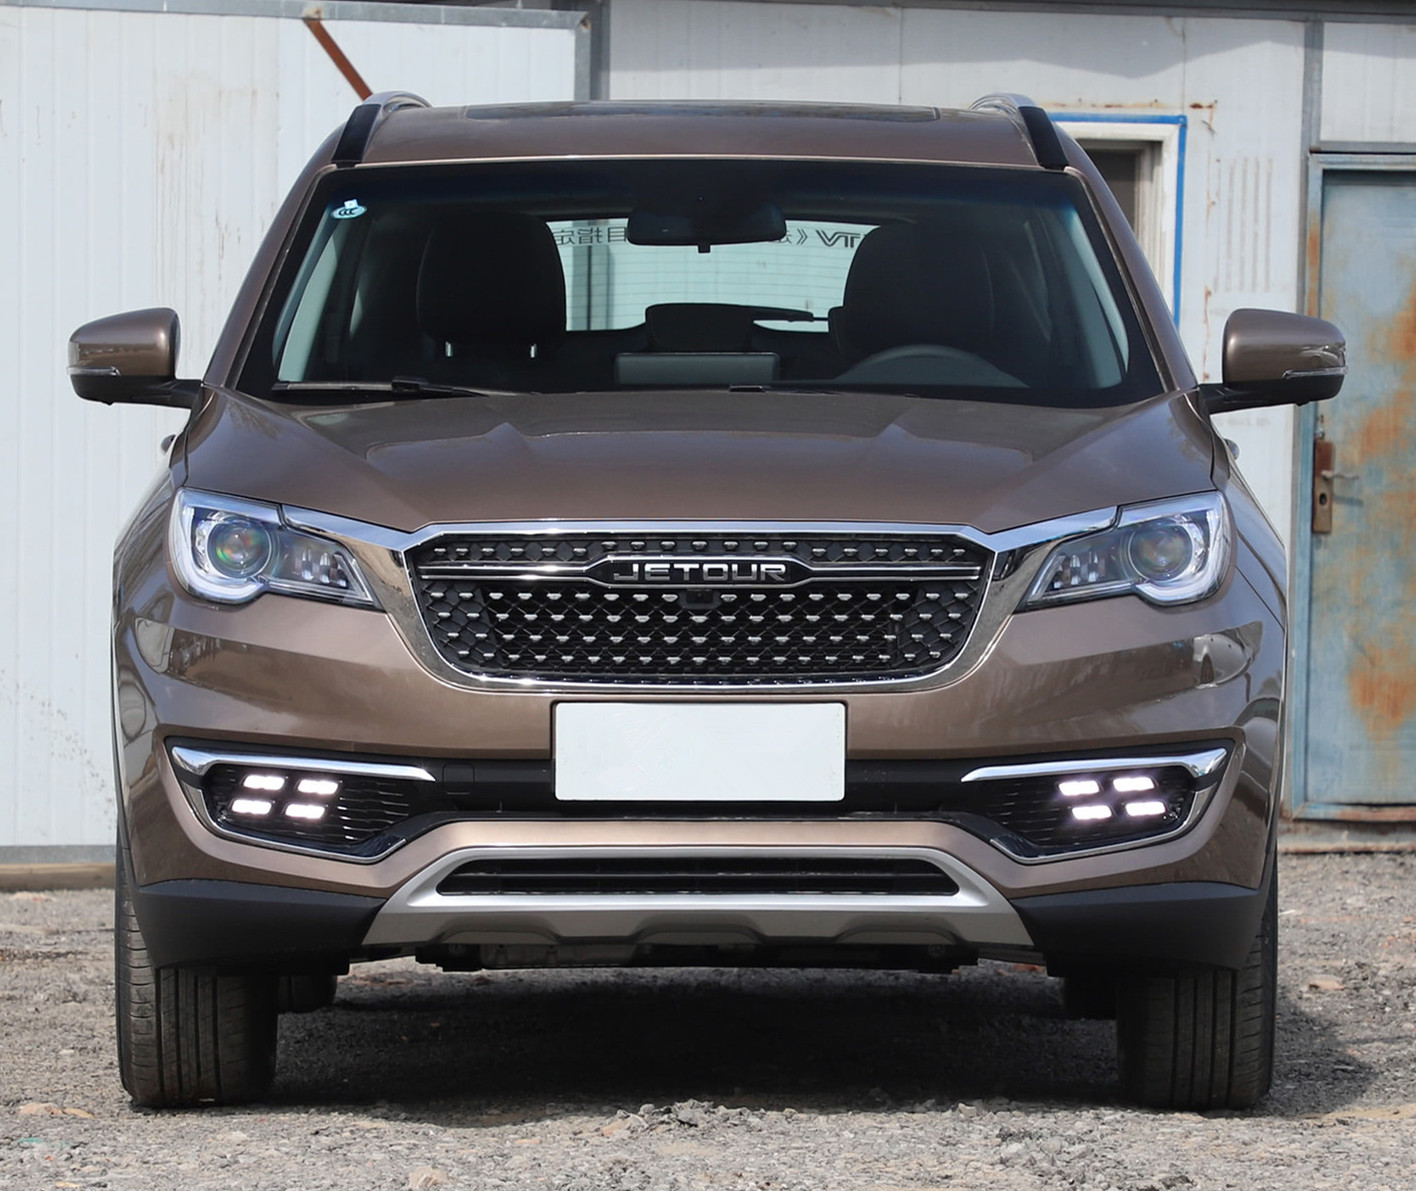 实力派SUV!整车质保20年,配1.5T+8AT,售7.69万起值了!